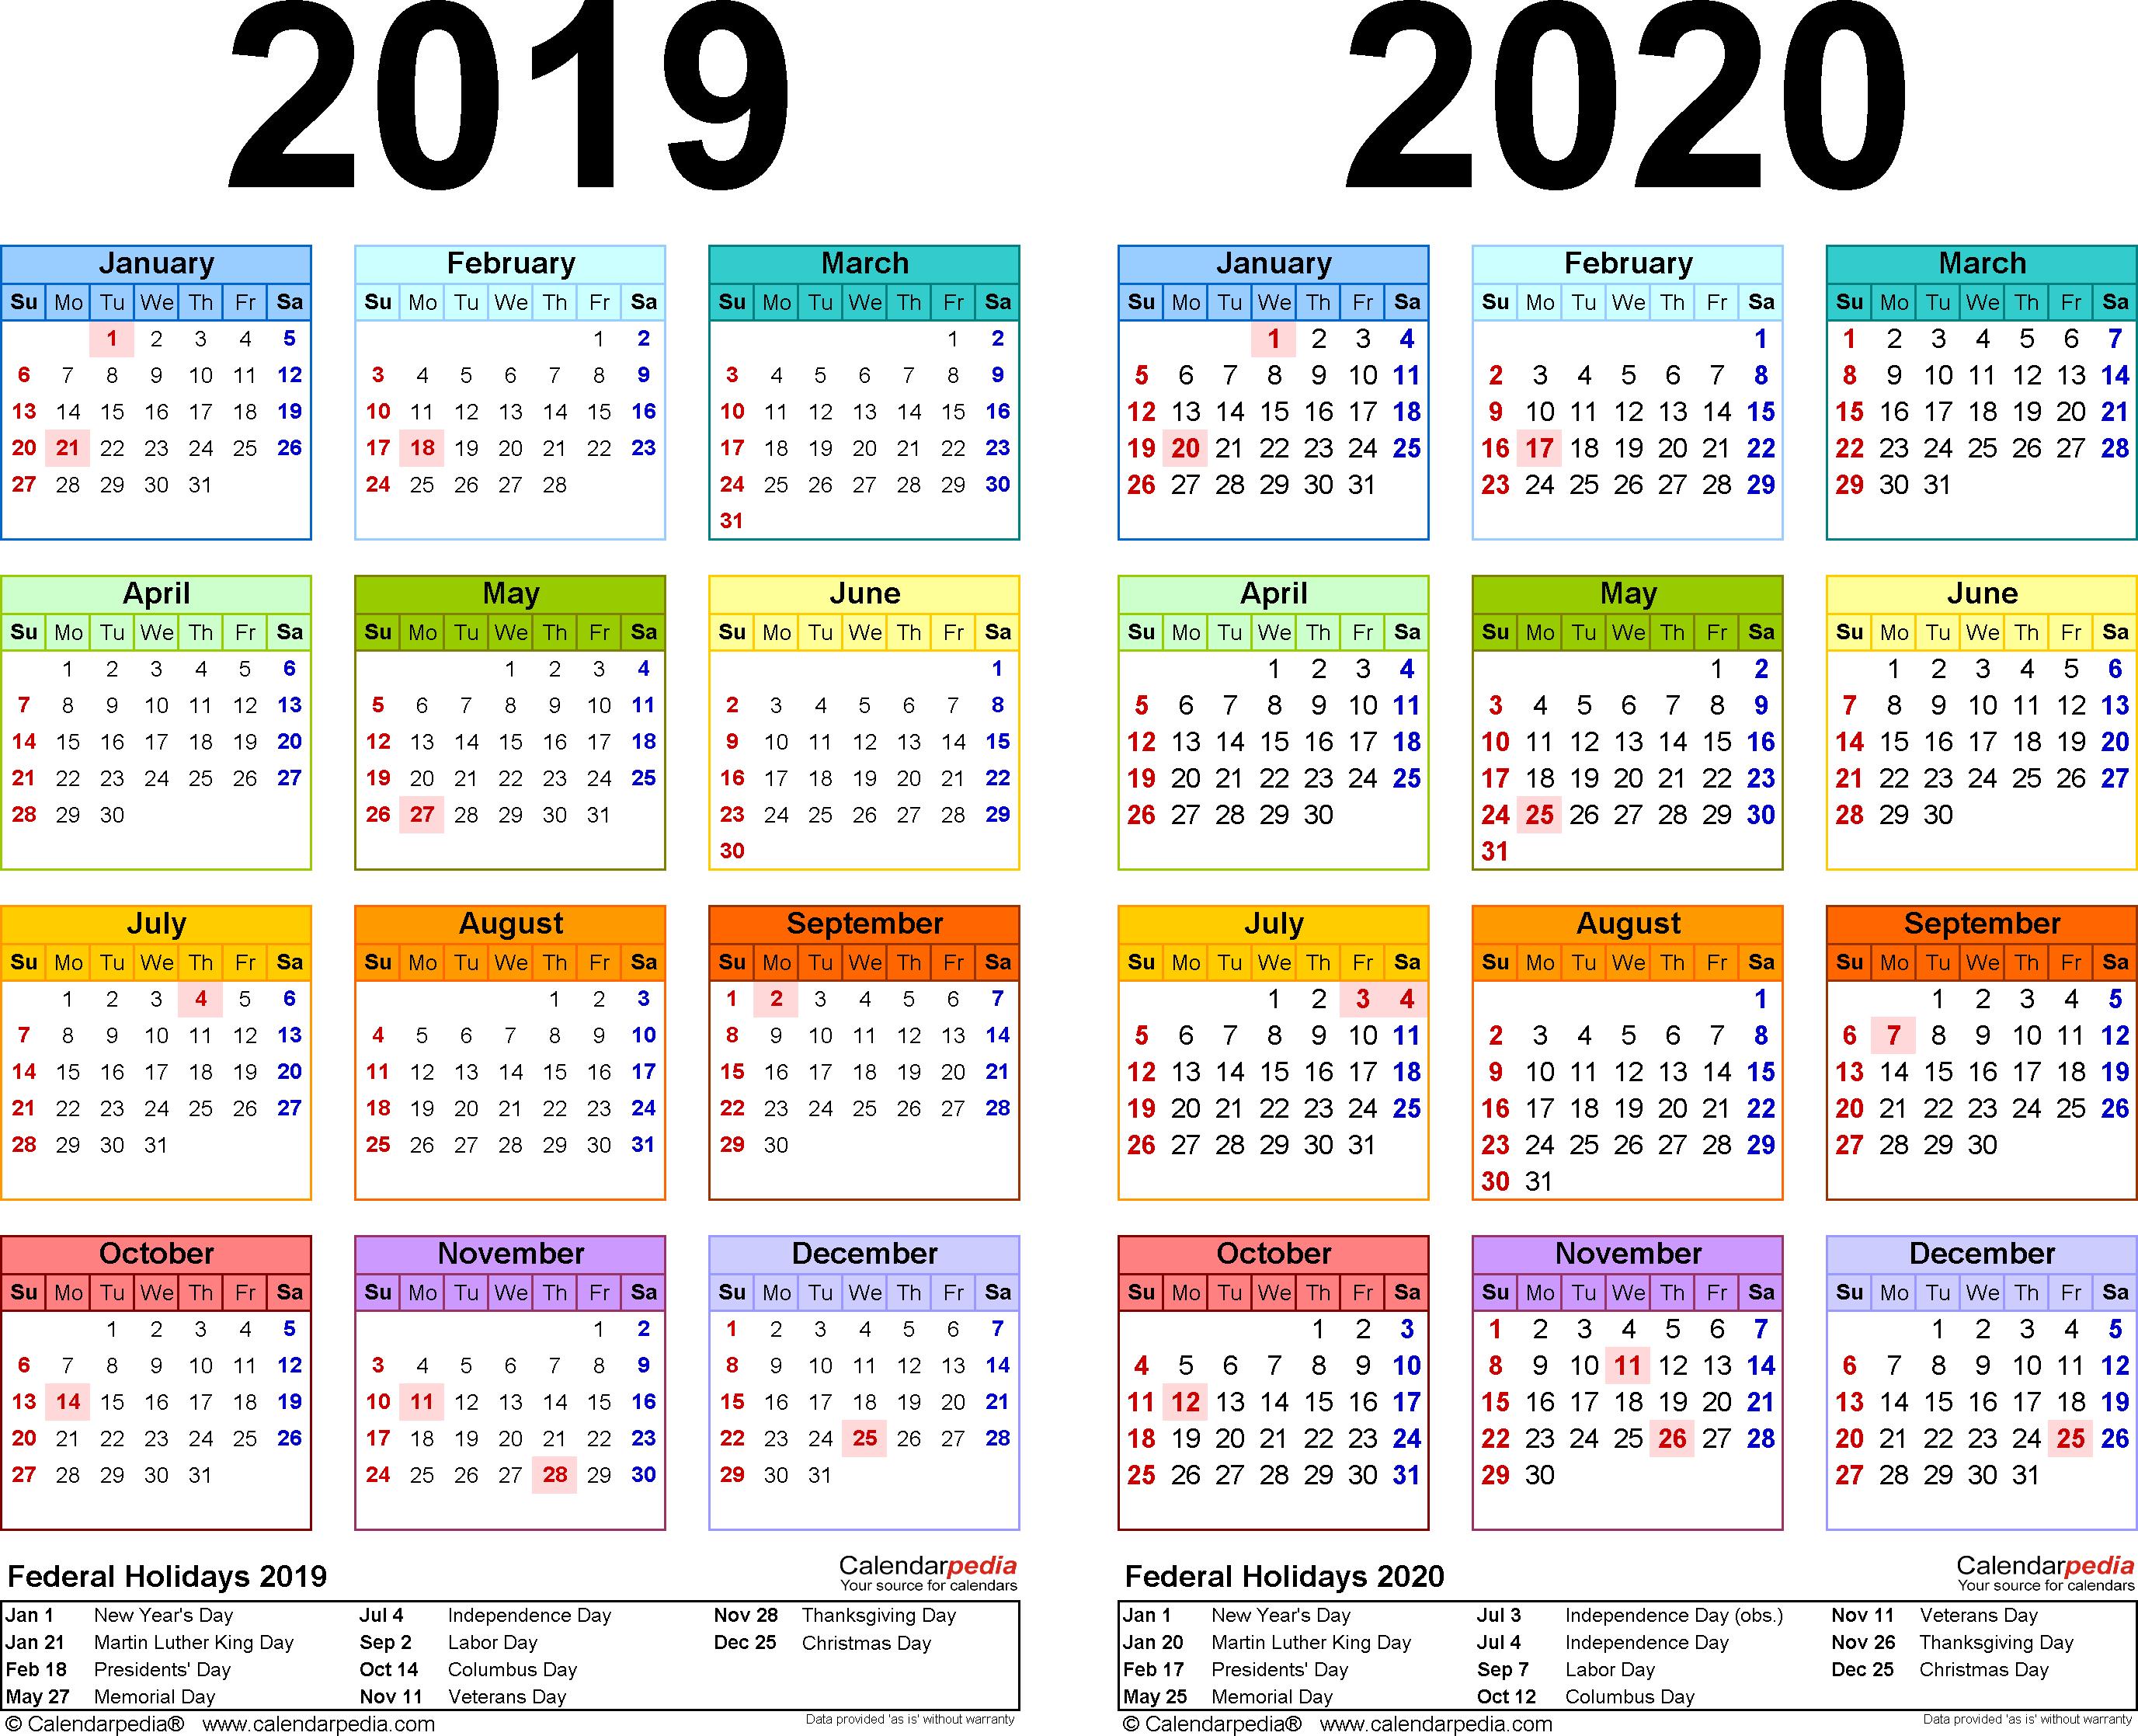 2019-2020 Calendar - Free Printable Two-Year Pdf Calendars within 2019-2020 Calendar Printable Free No Download